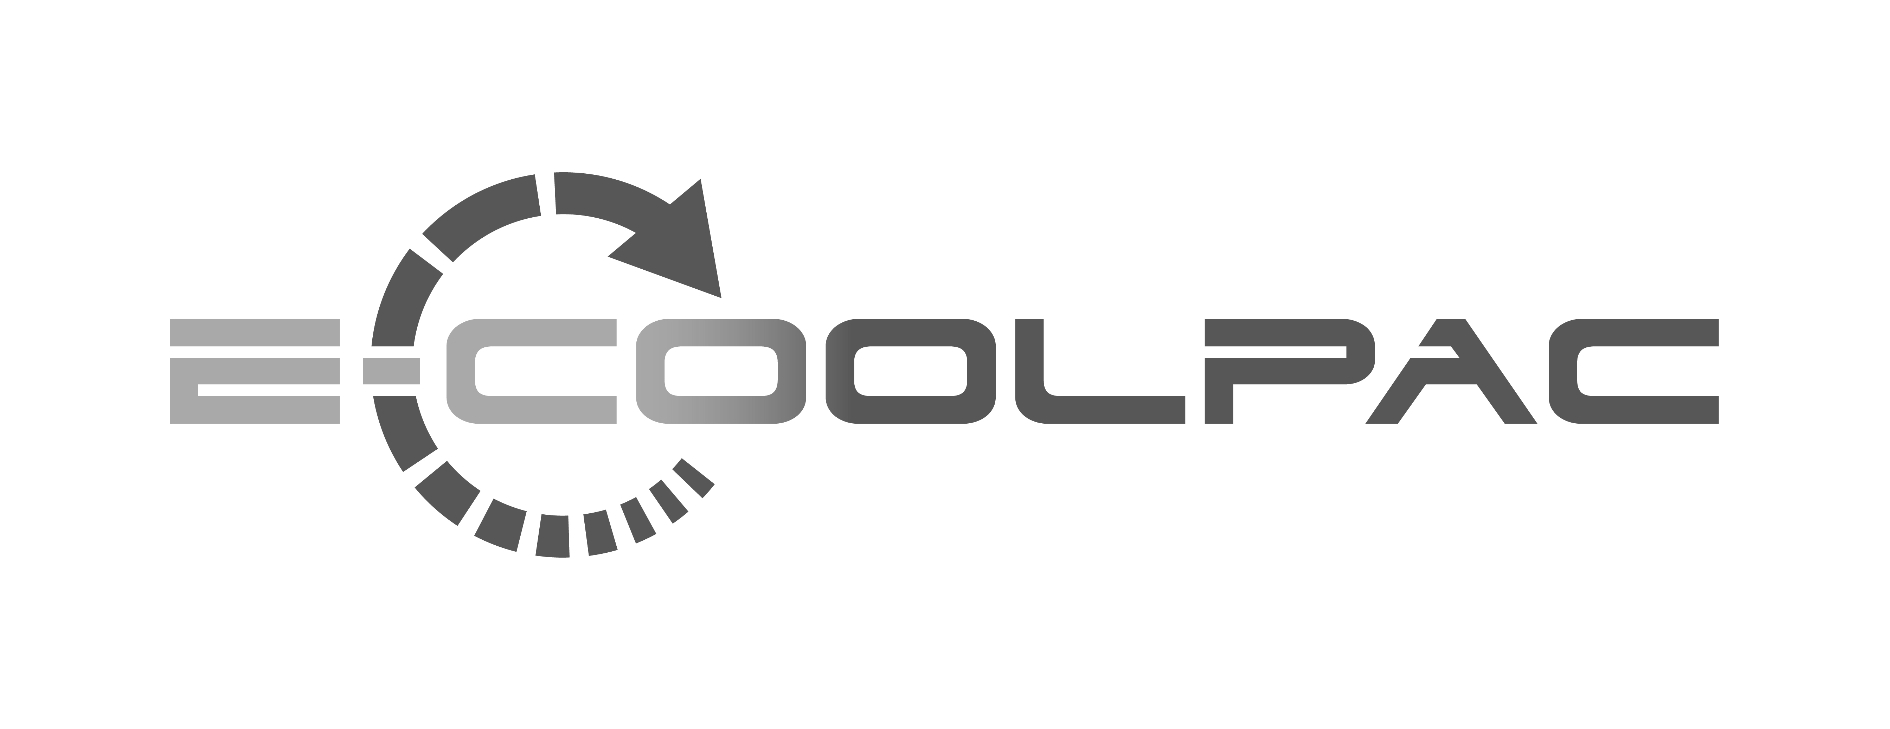 E-COOLPAC